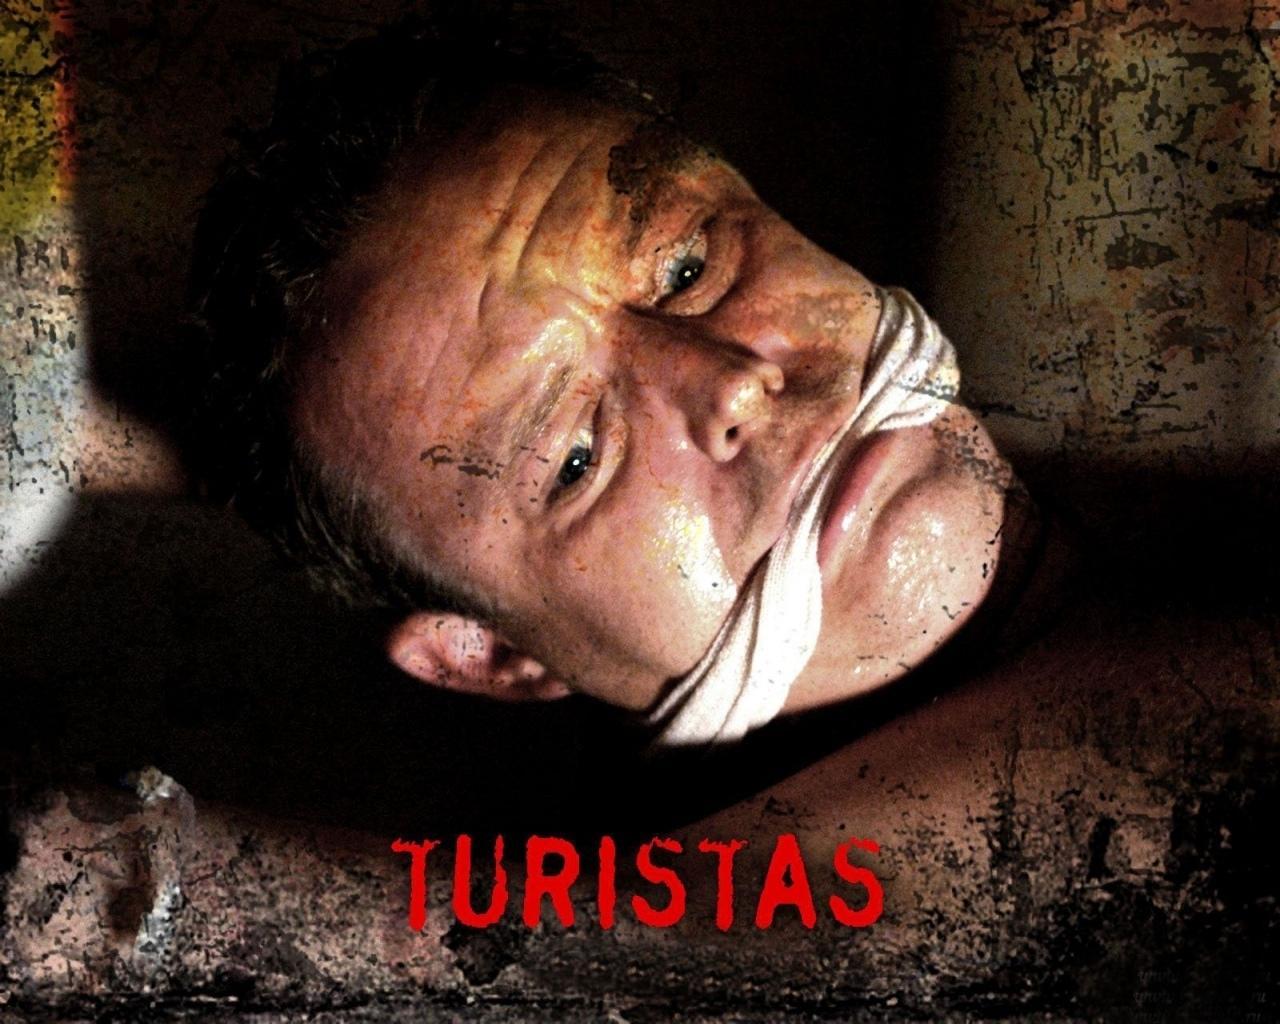 Картинки Туристас кино Фильмы